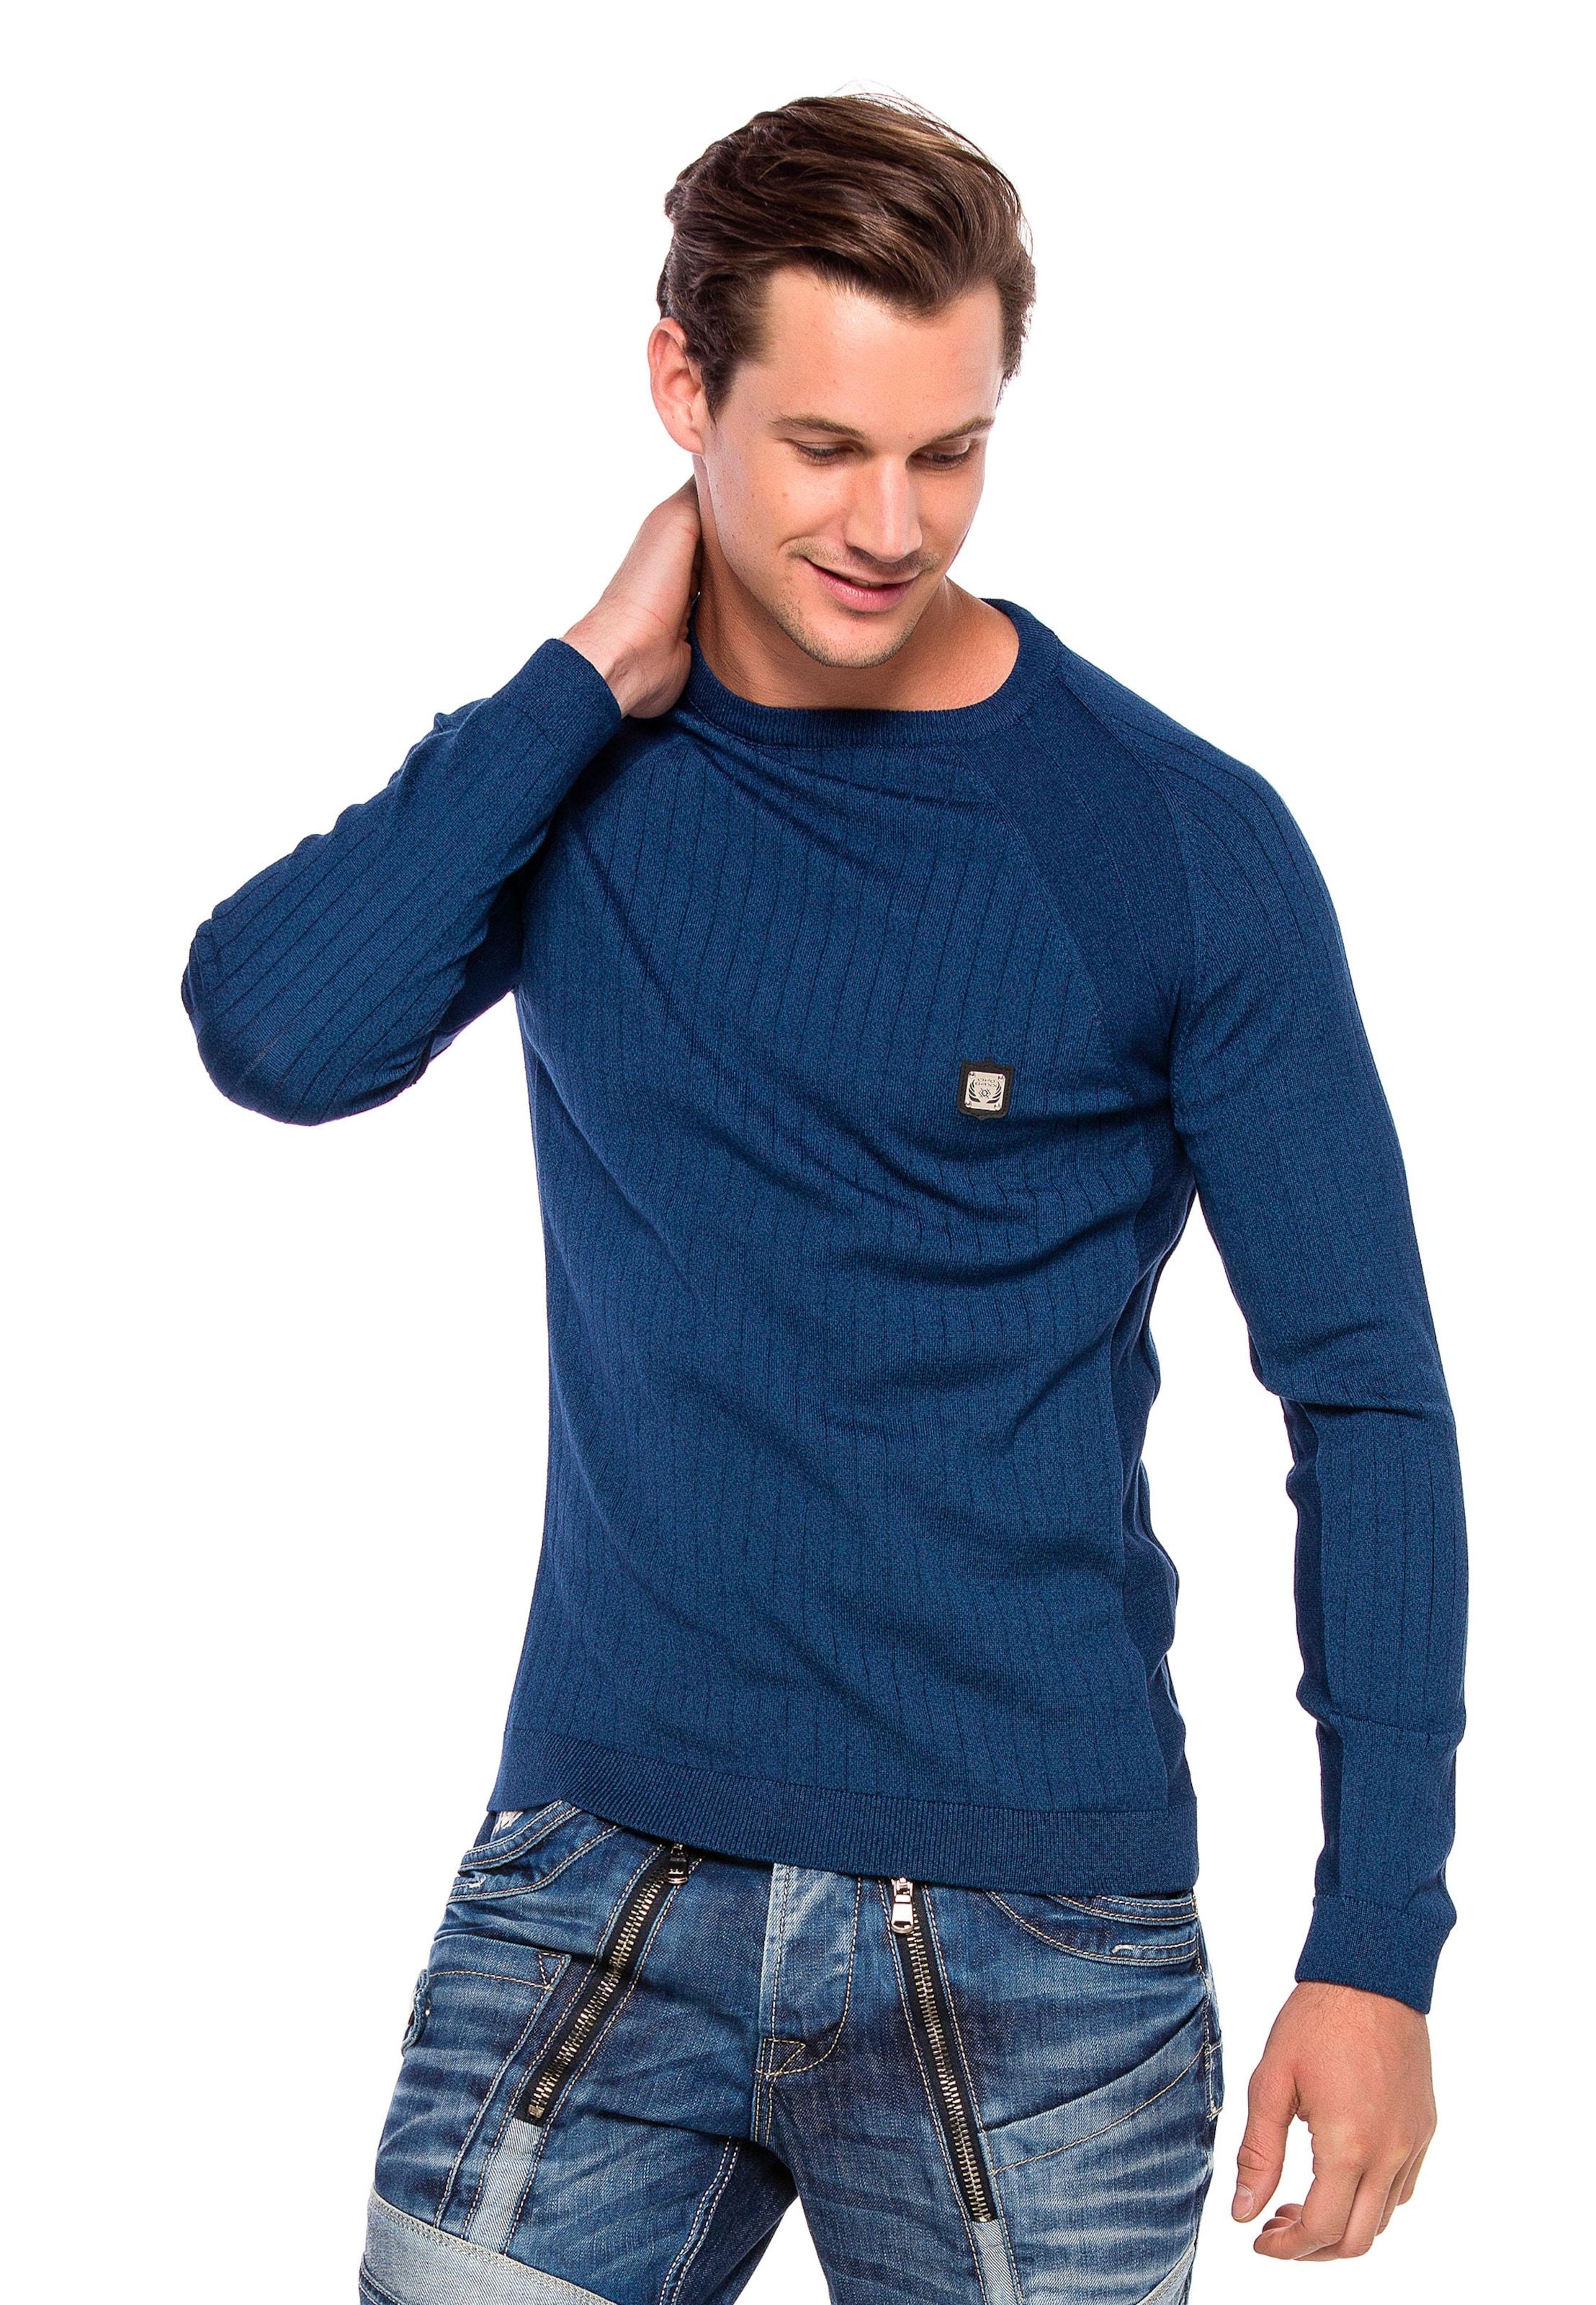 CIPO & BAXX Pullover in blau Unifarben 3179100